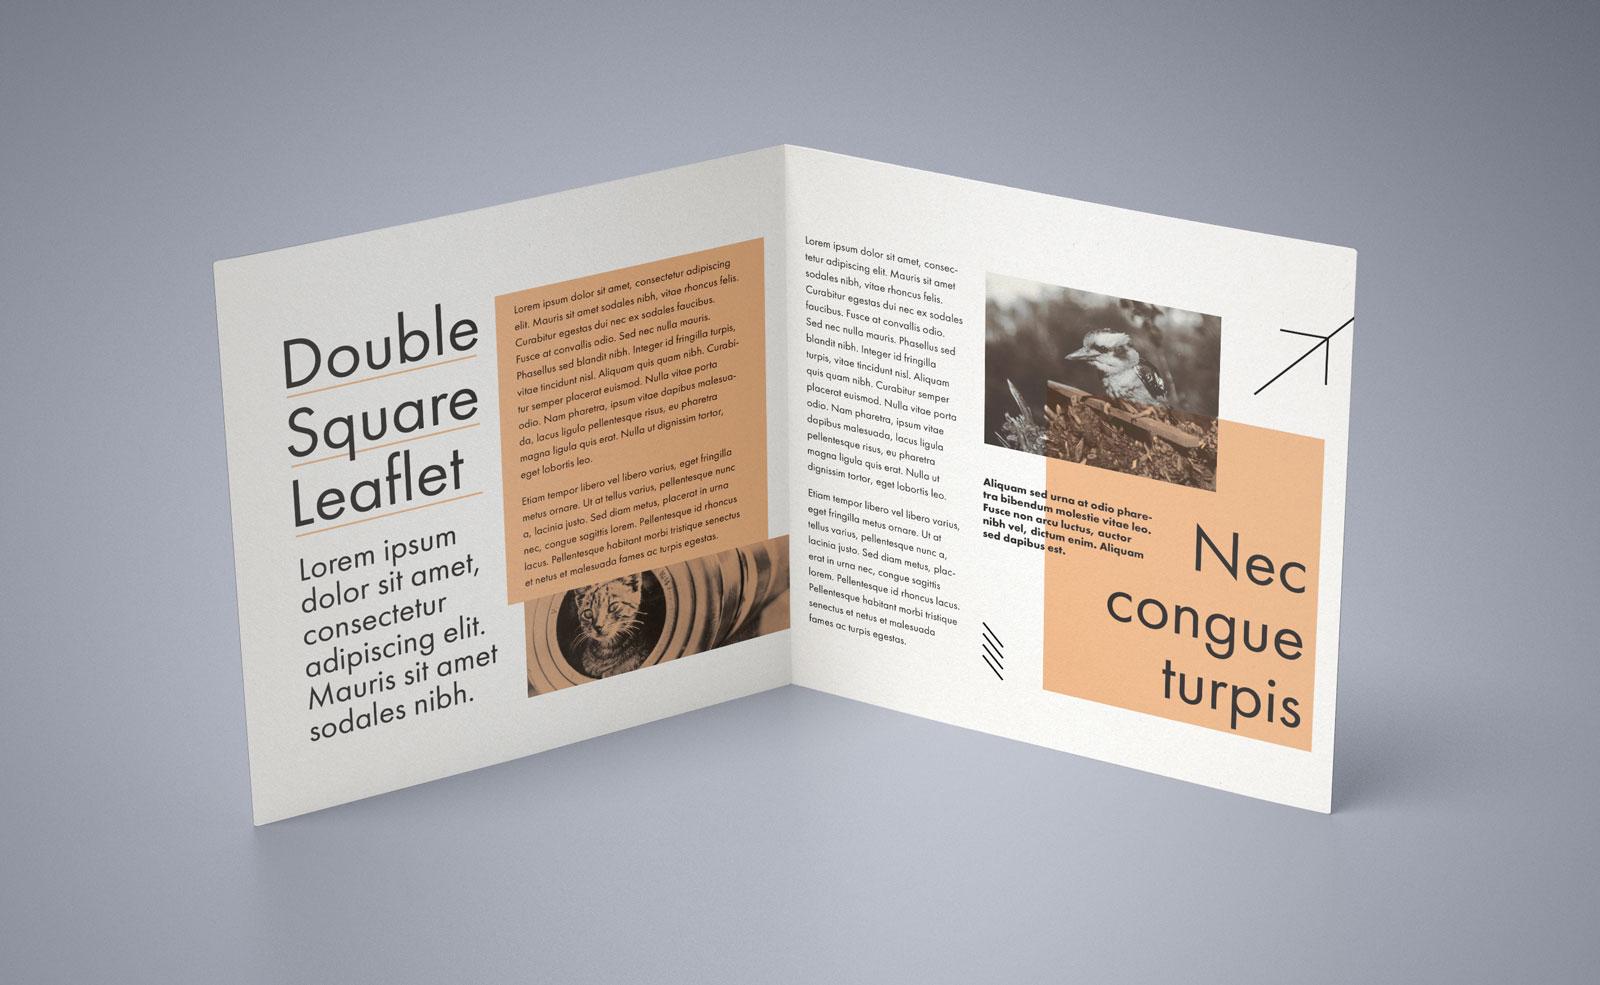 Free-Square-Bi-Fold-Brochure-Mockup-PSD-file-3